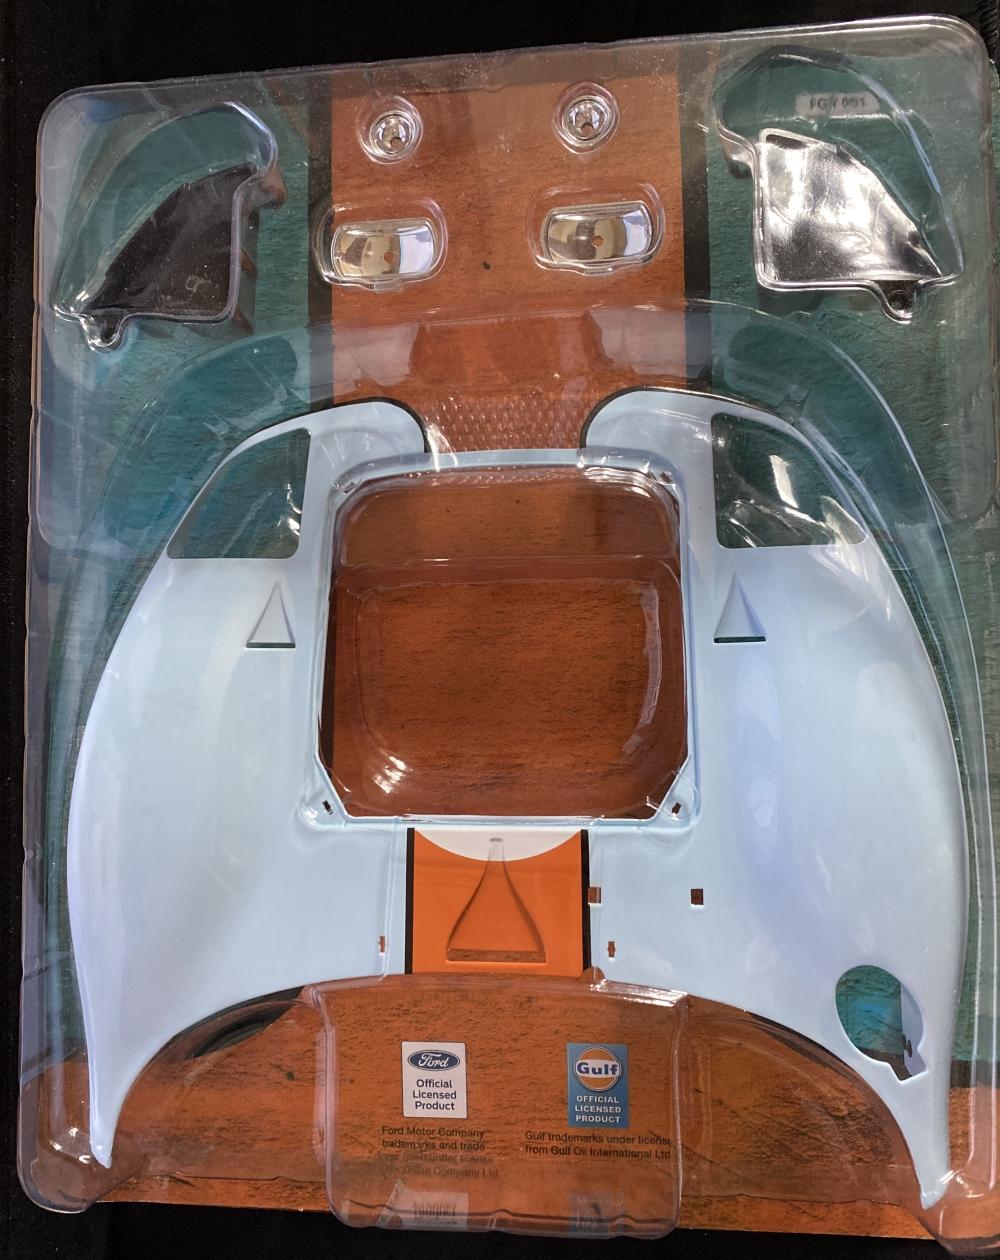 Ford GT / DeAgostini, 1:8 00111